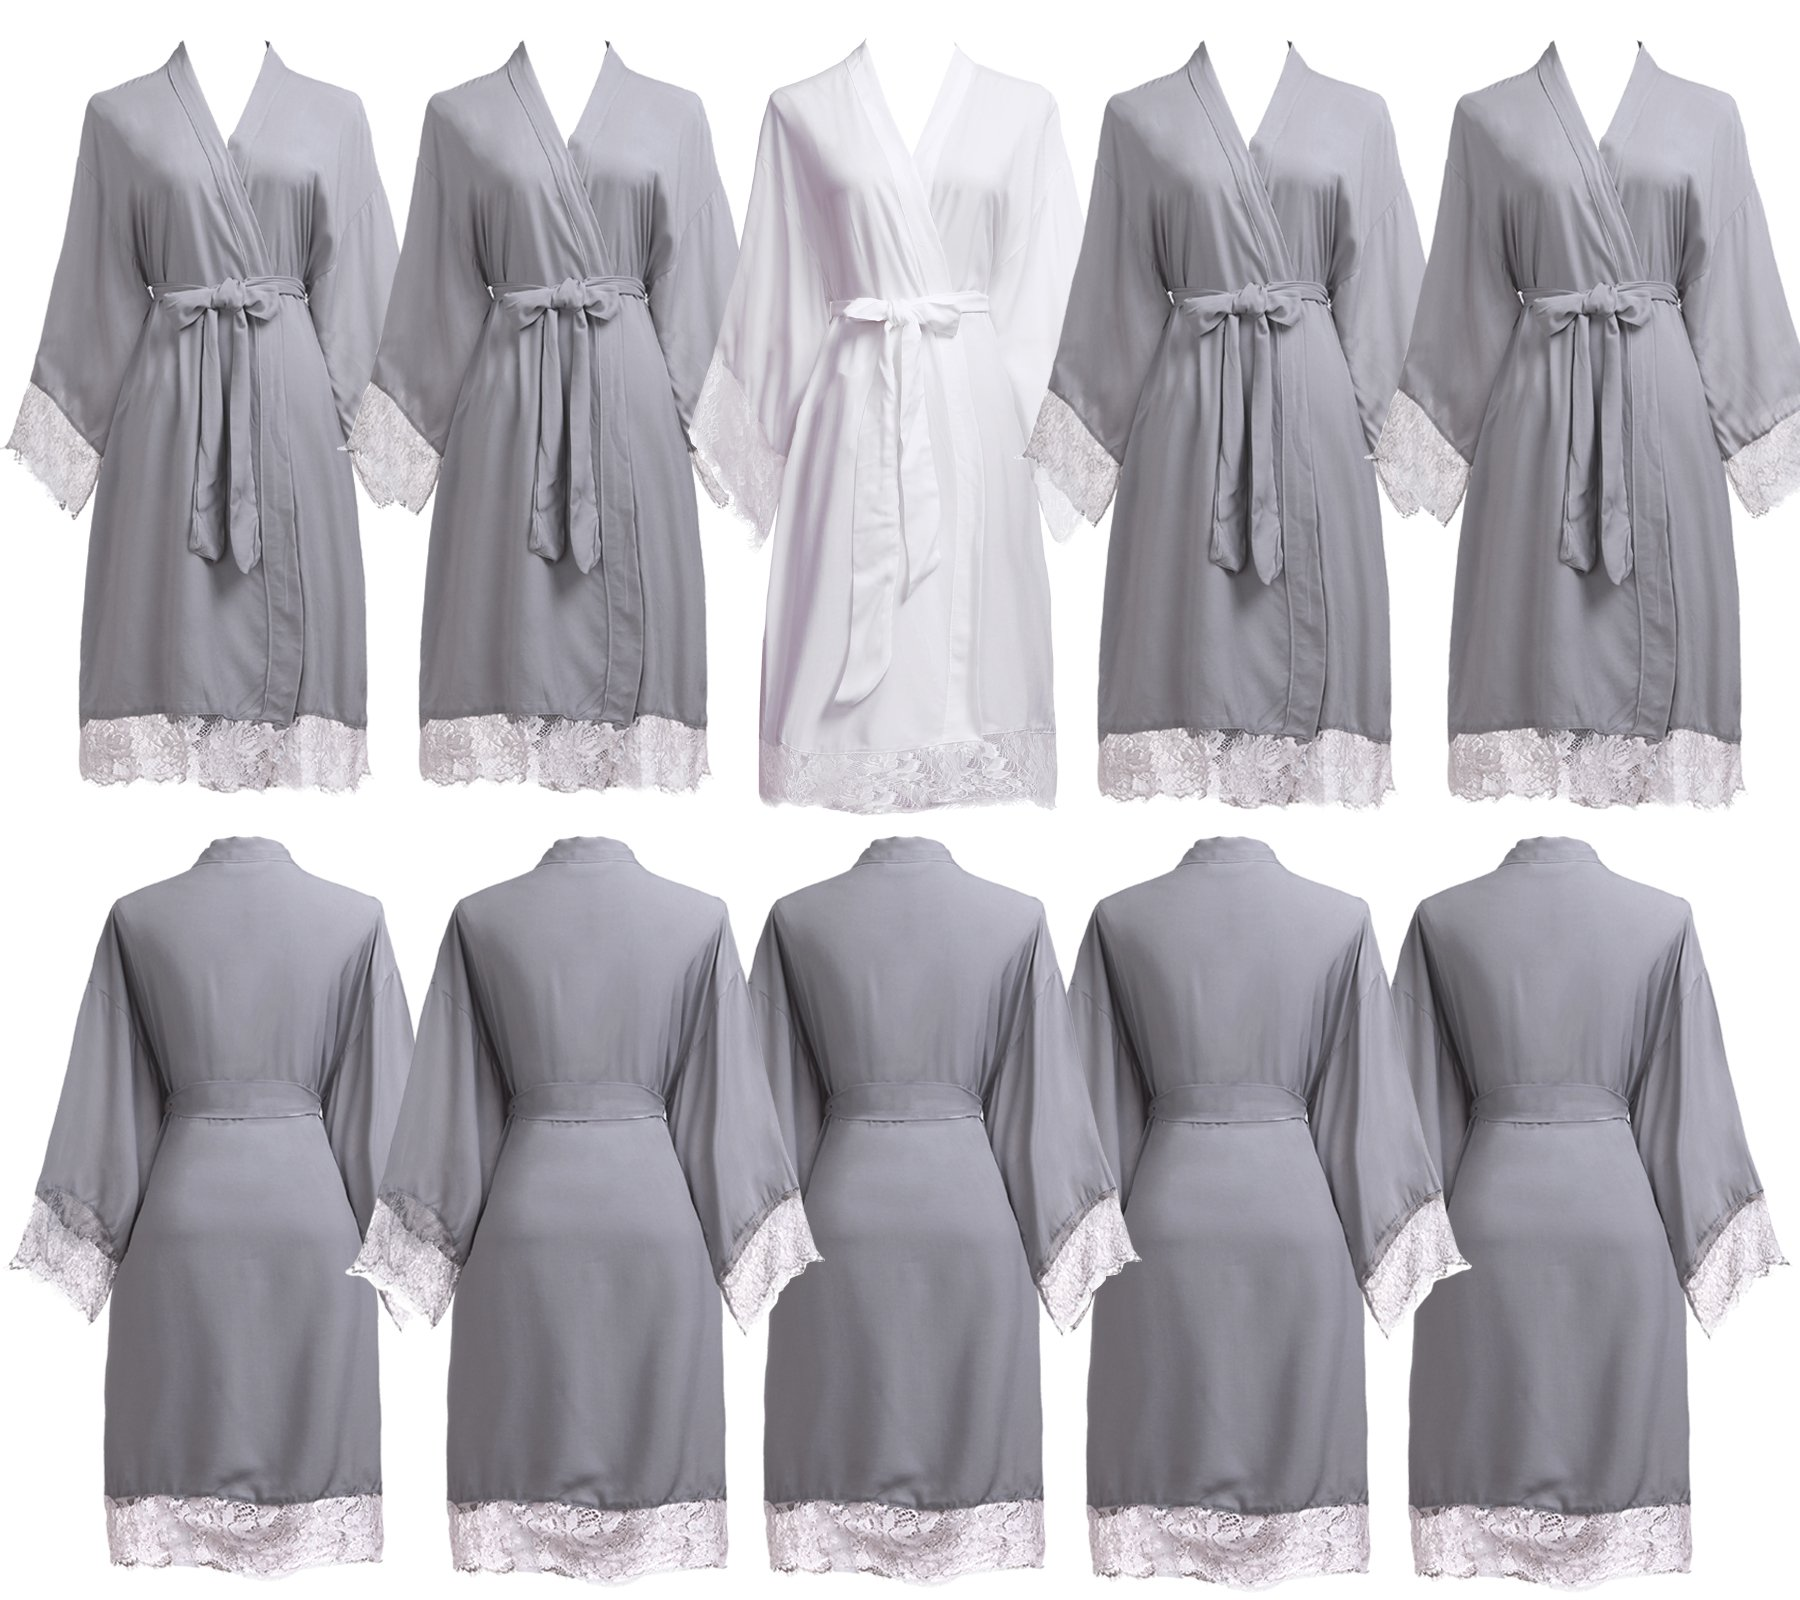 PROGULOVER Set Of 7-10 Women's Imitation Cotton Wedding Robes For Bride and Bridesmaid Wedding Party Kimono Robes Short